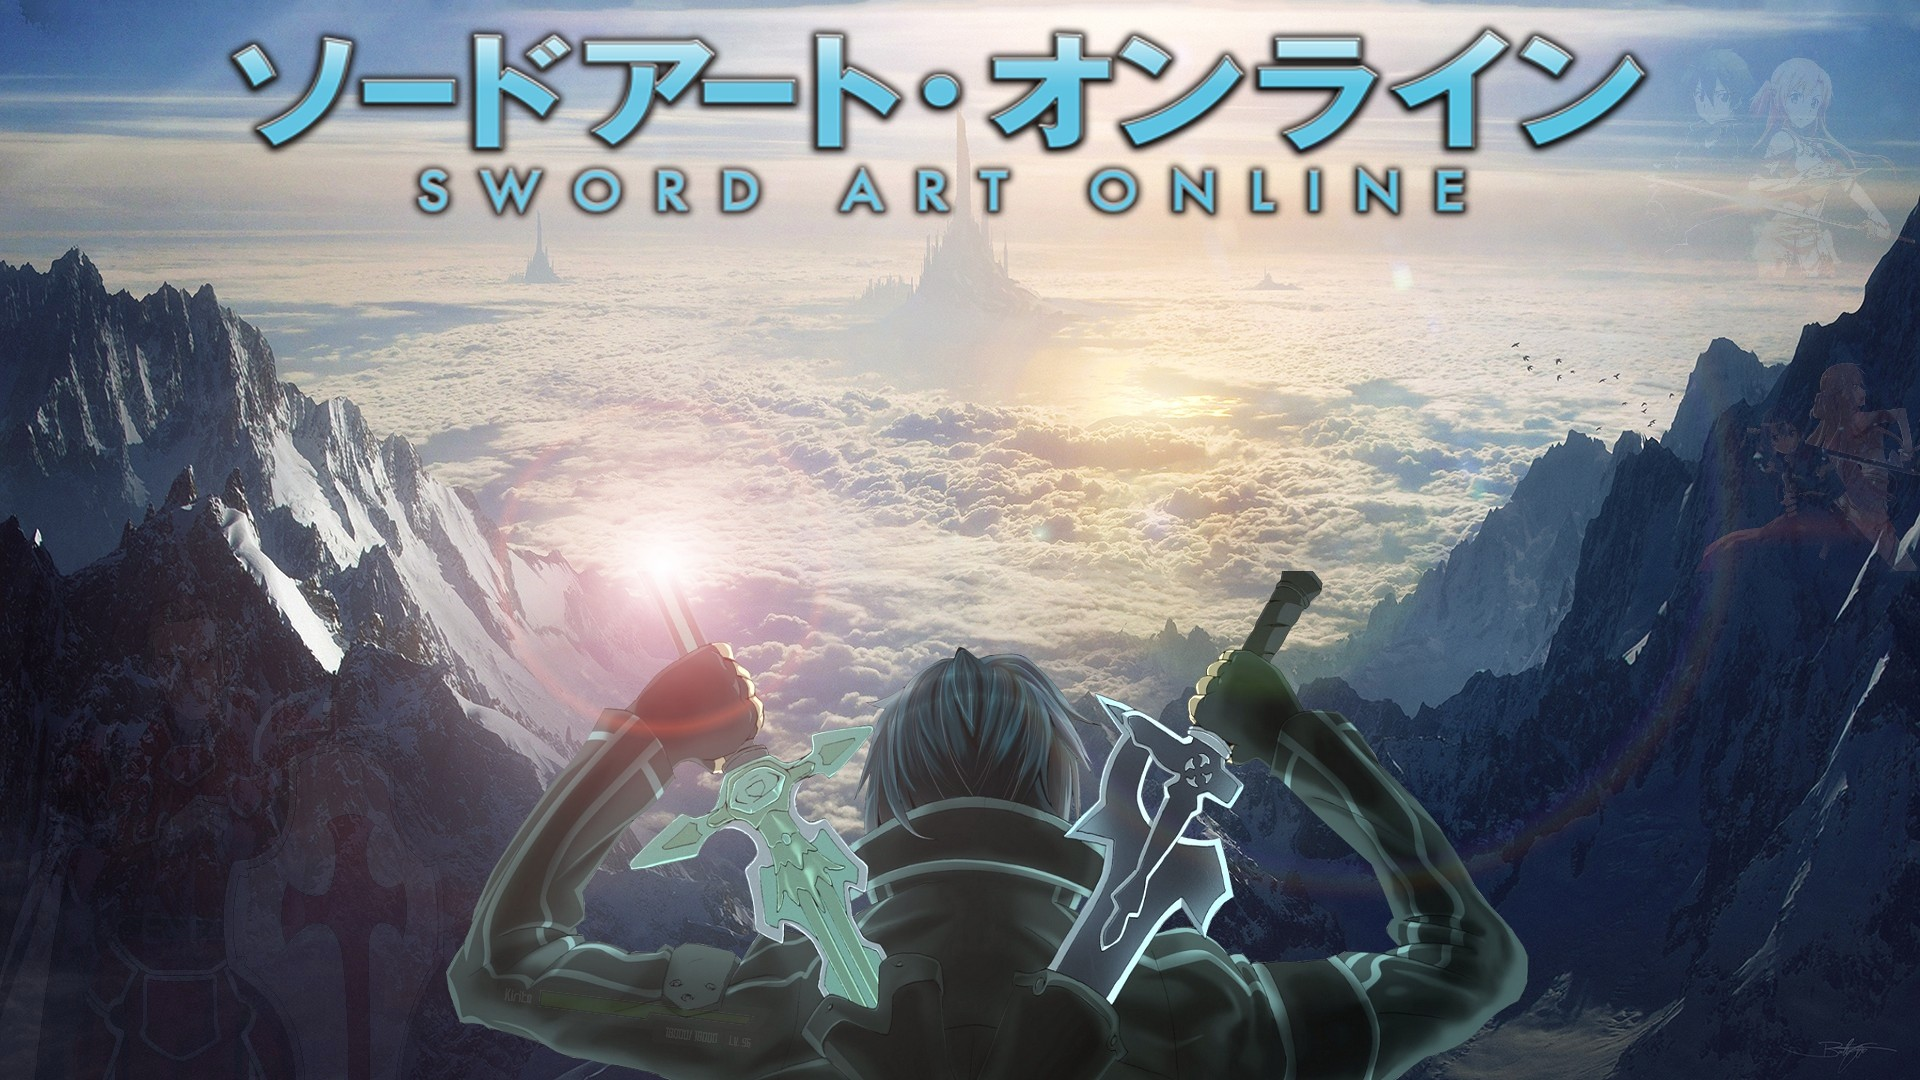 ImageMade This Sword Art Online Wallpaper.